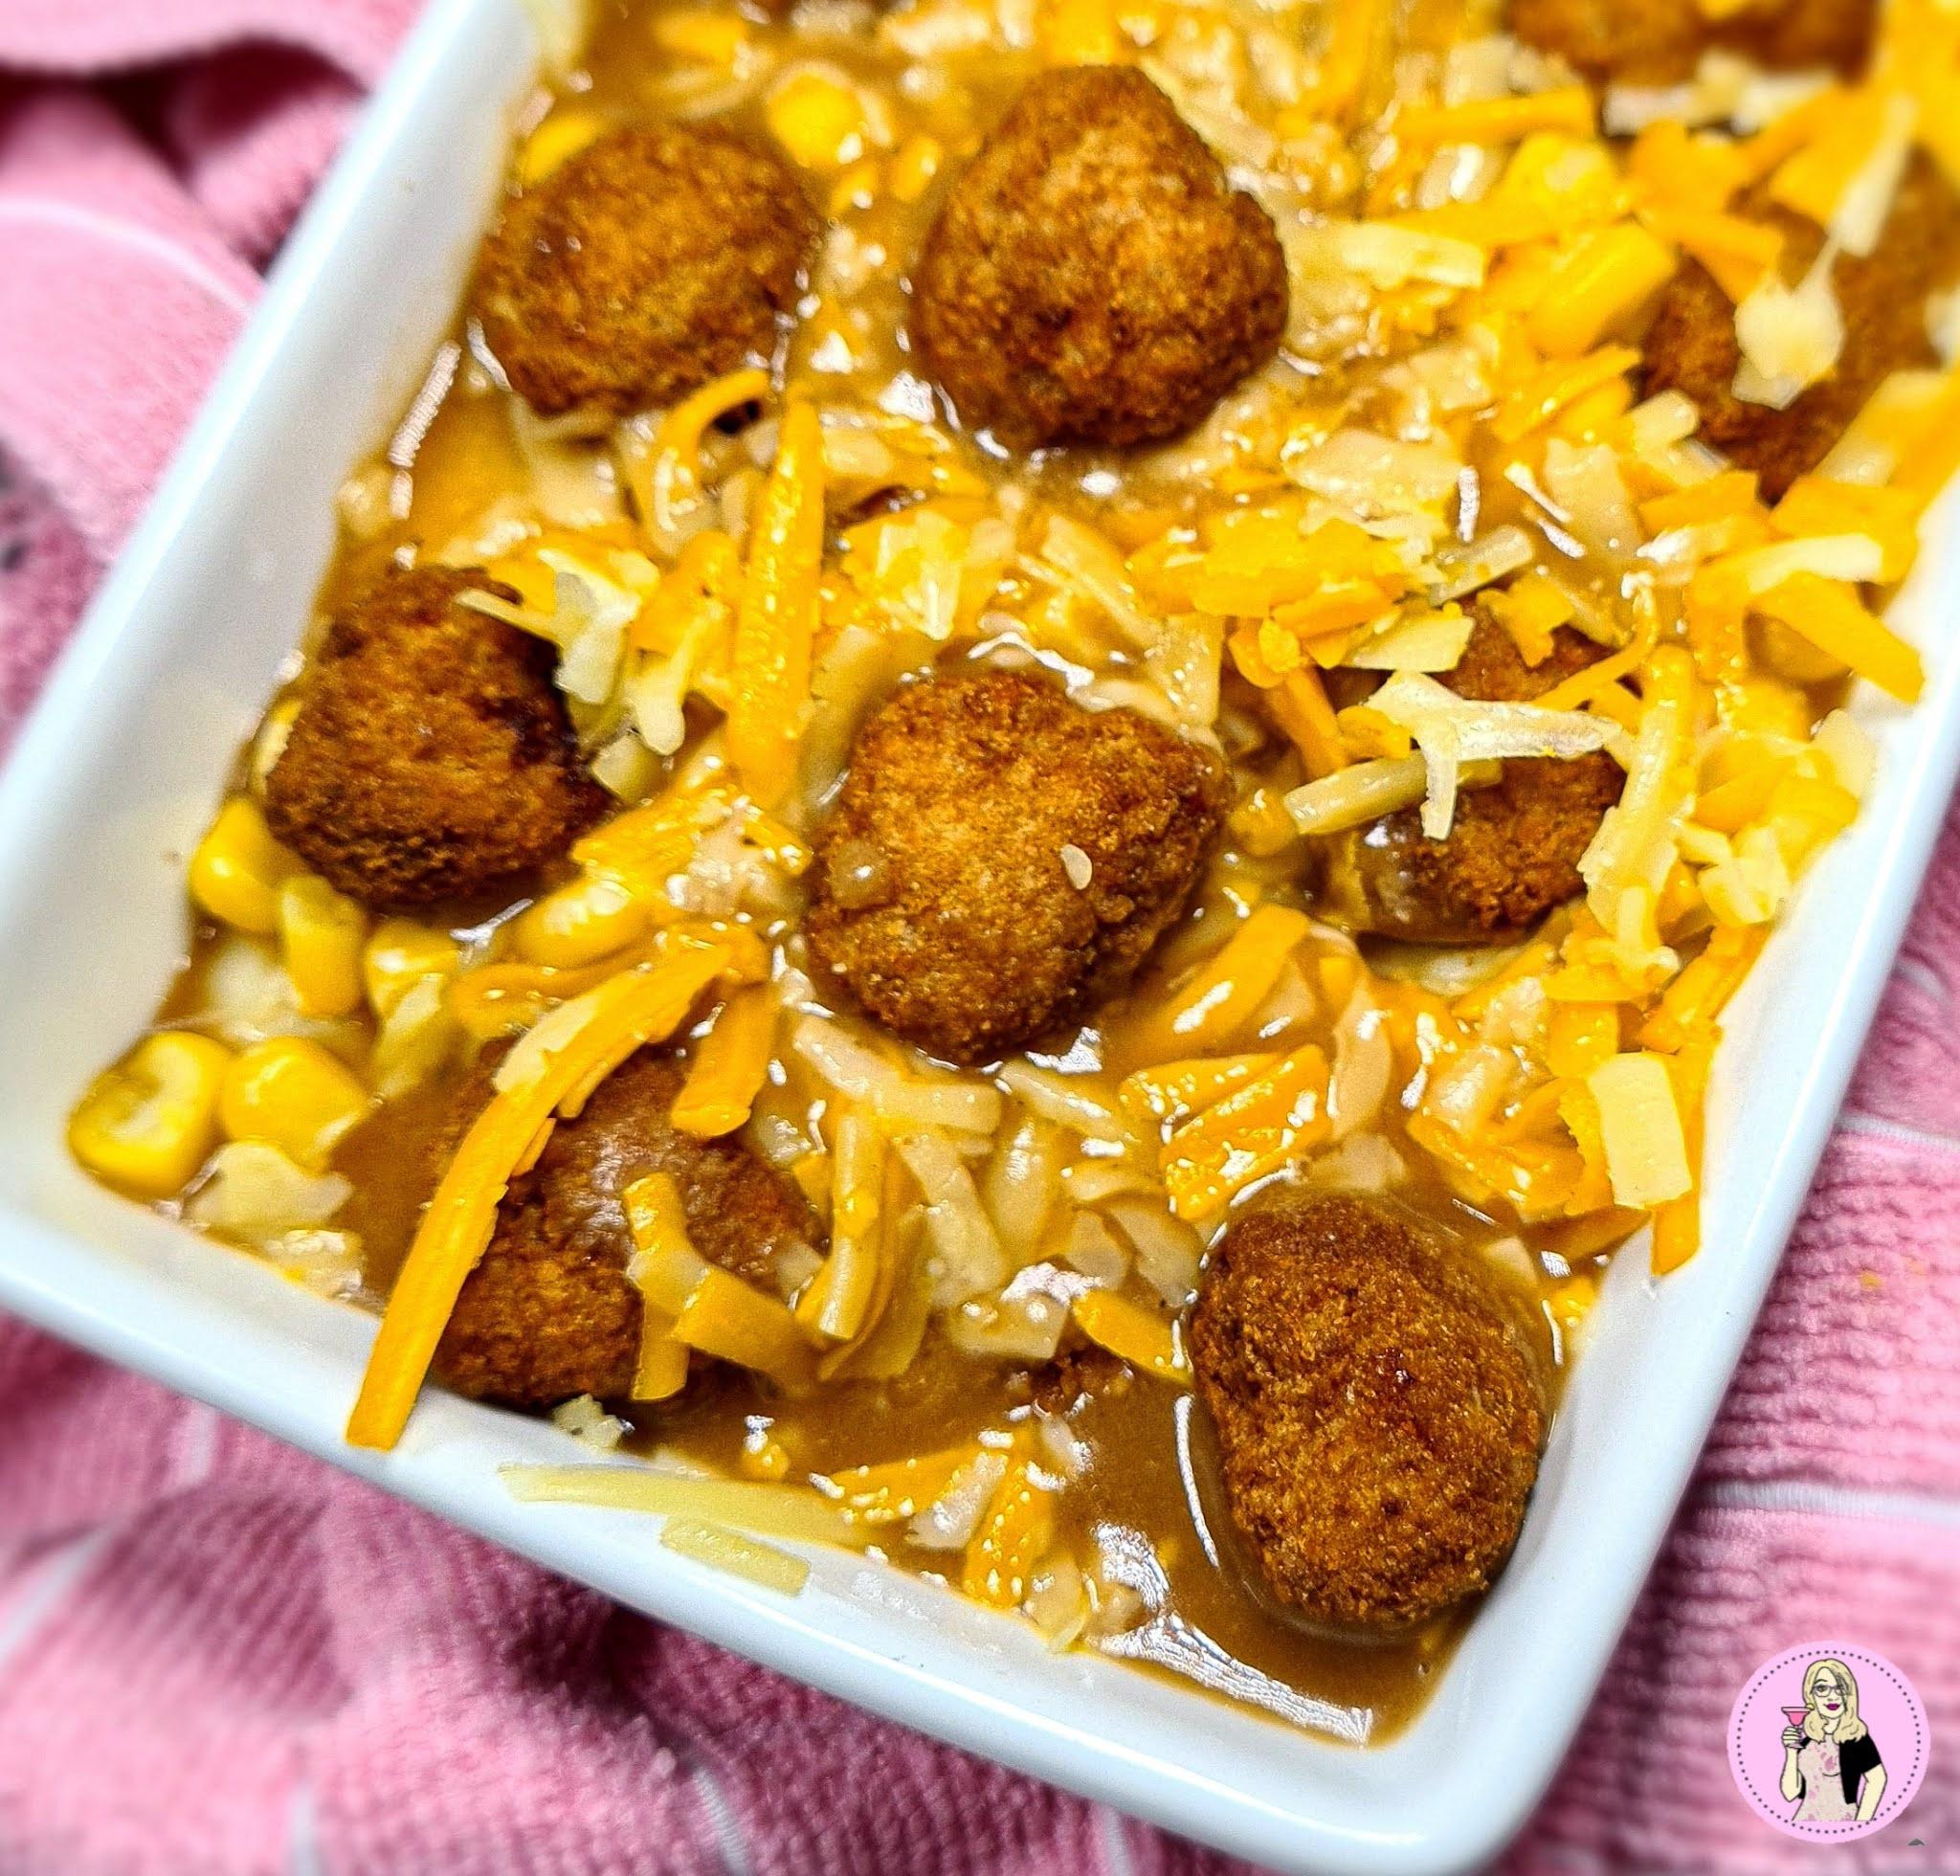 KFC Famous Bowl Fakeaway Recipe | Slimming Friendly Low Calorie